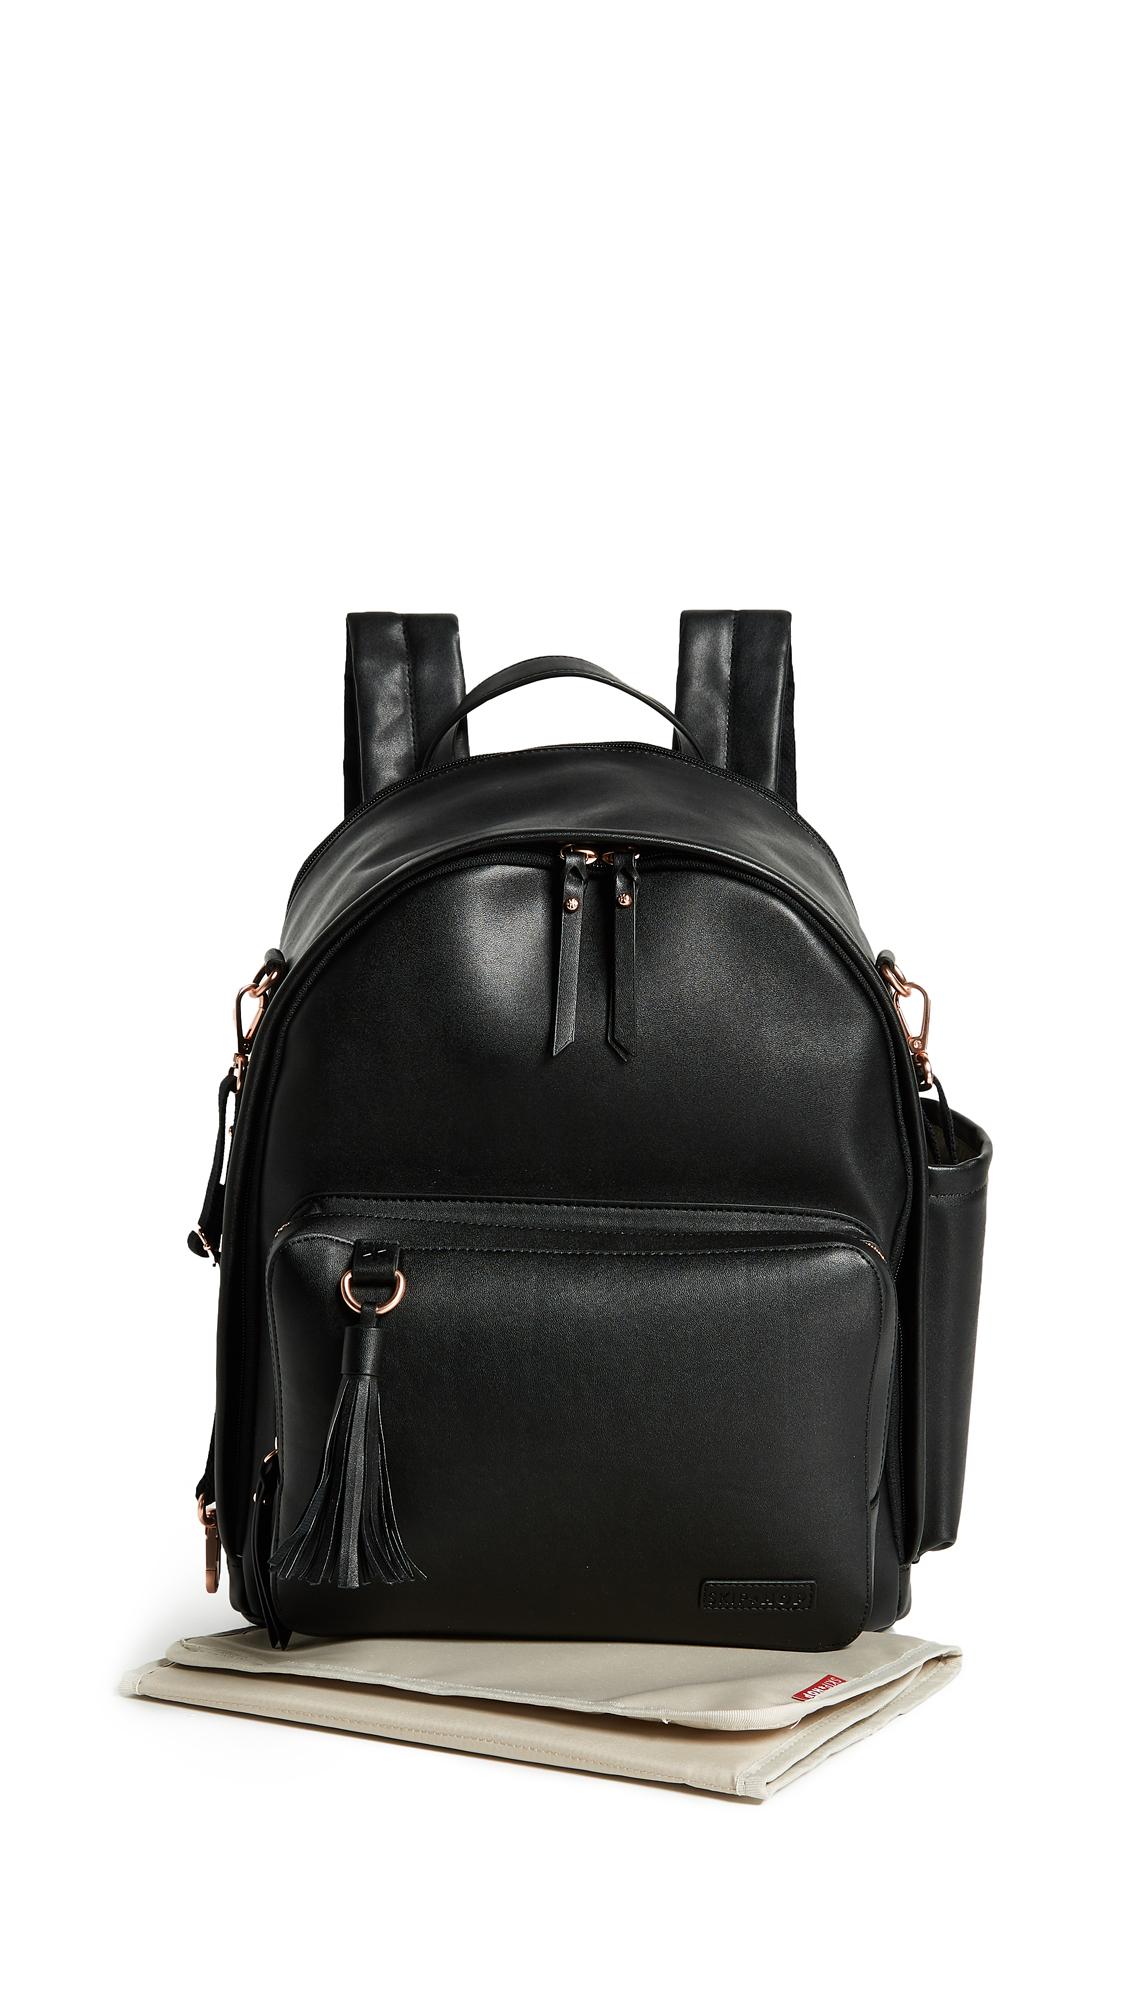 Skip Hop Greenwich Simply Chic Diaper Backpack - Black